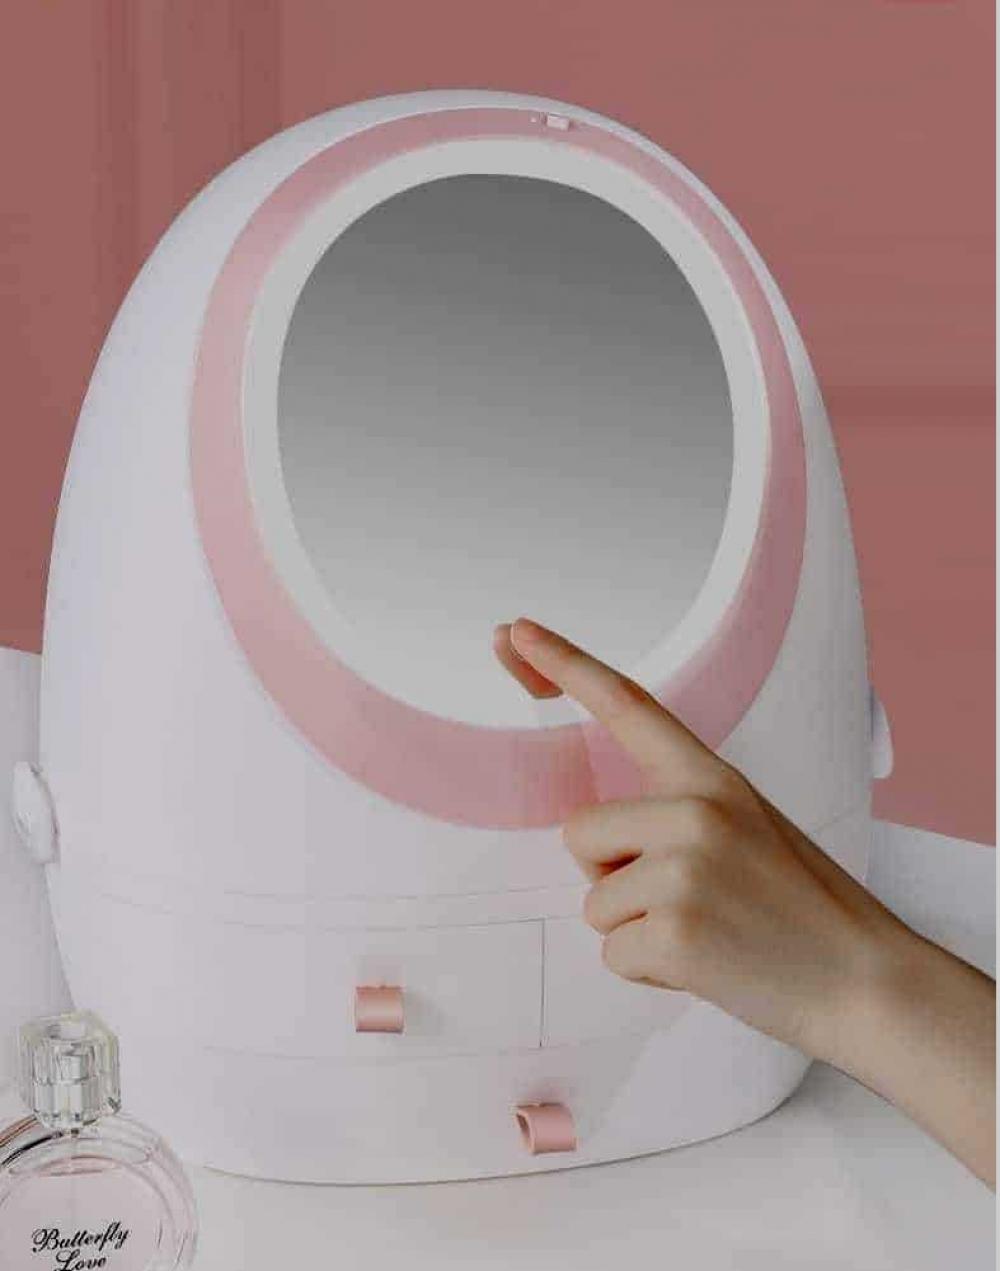 Portable Cosmetic Case Makeup Organizer Storage Box With HD Mirror